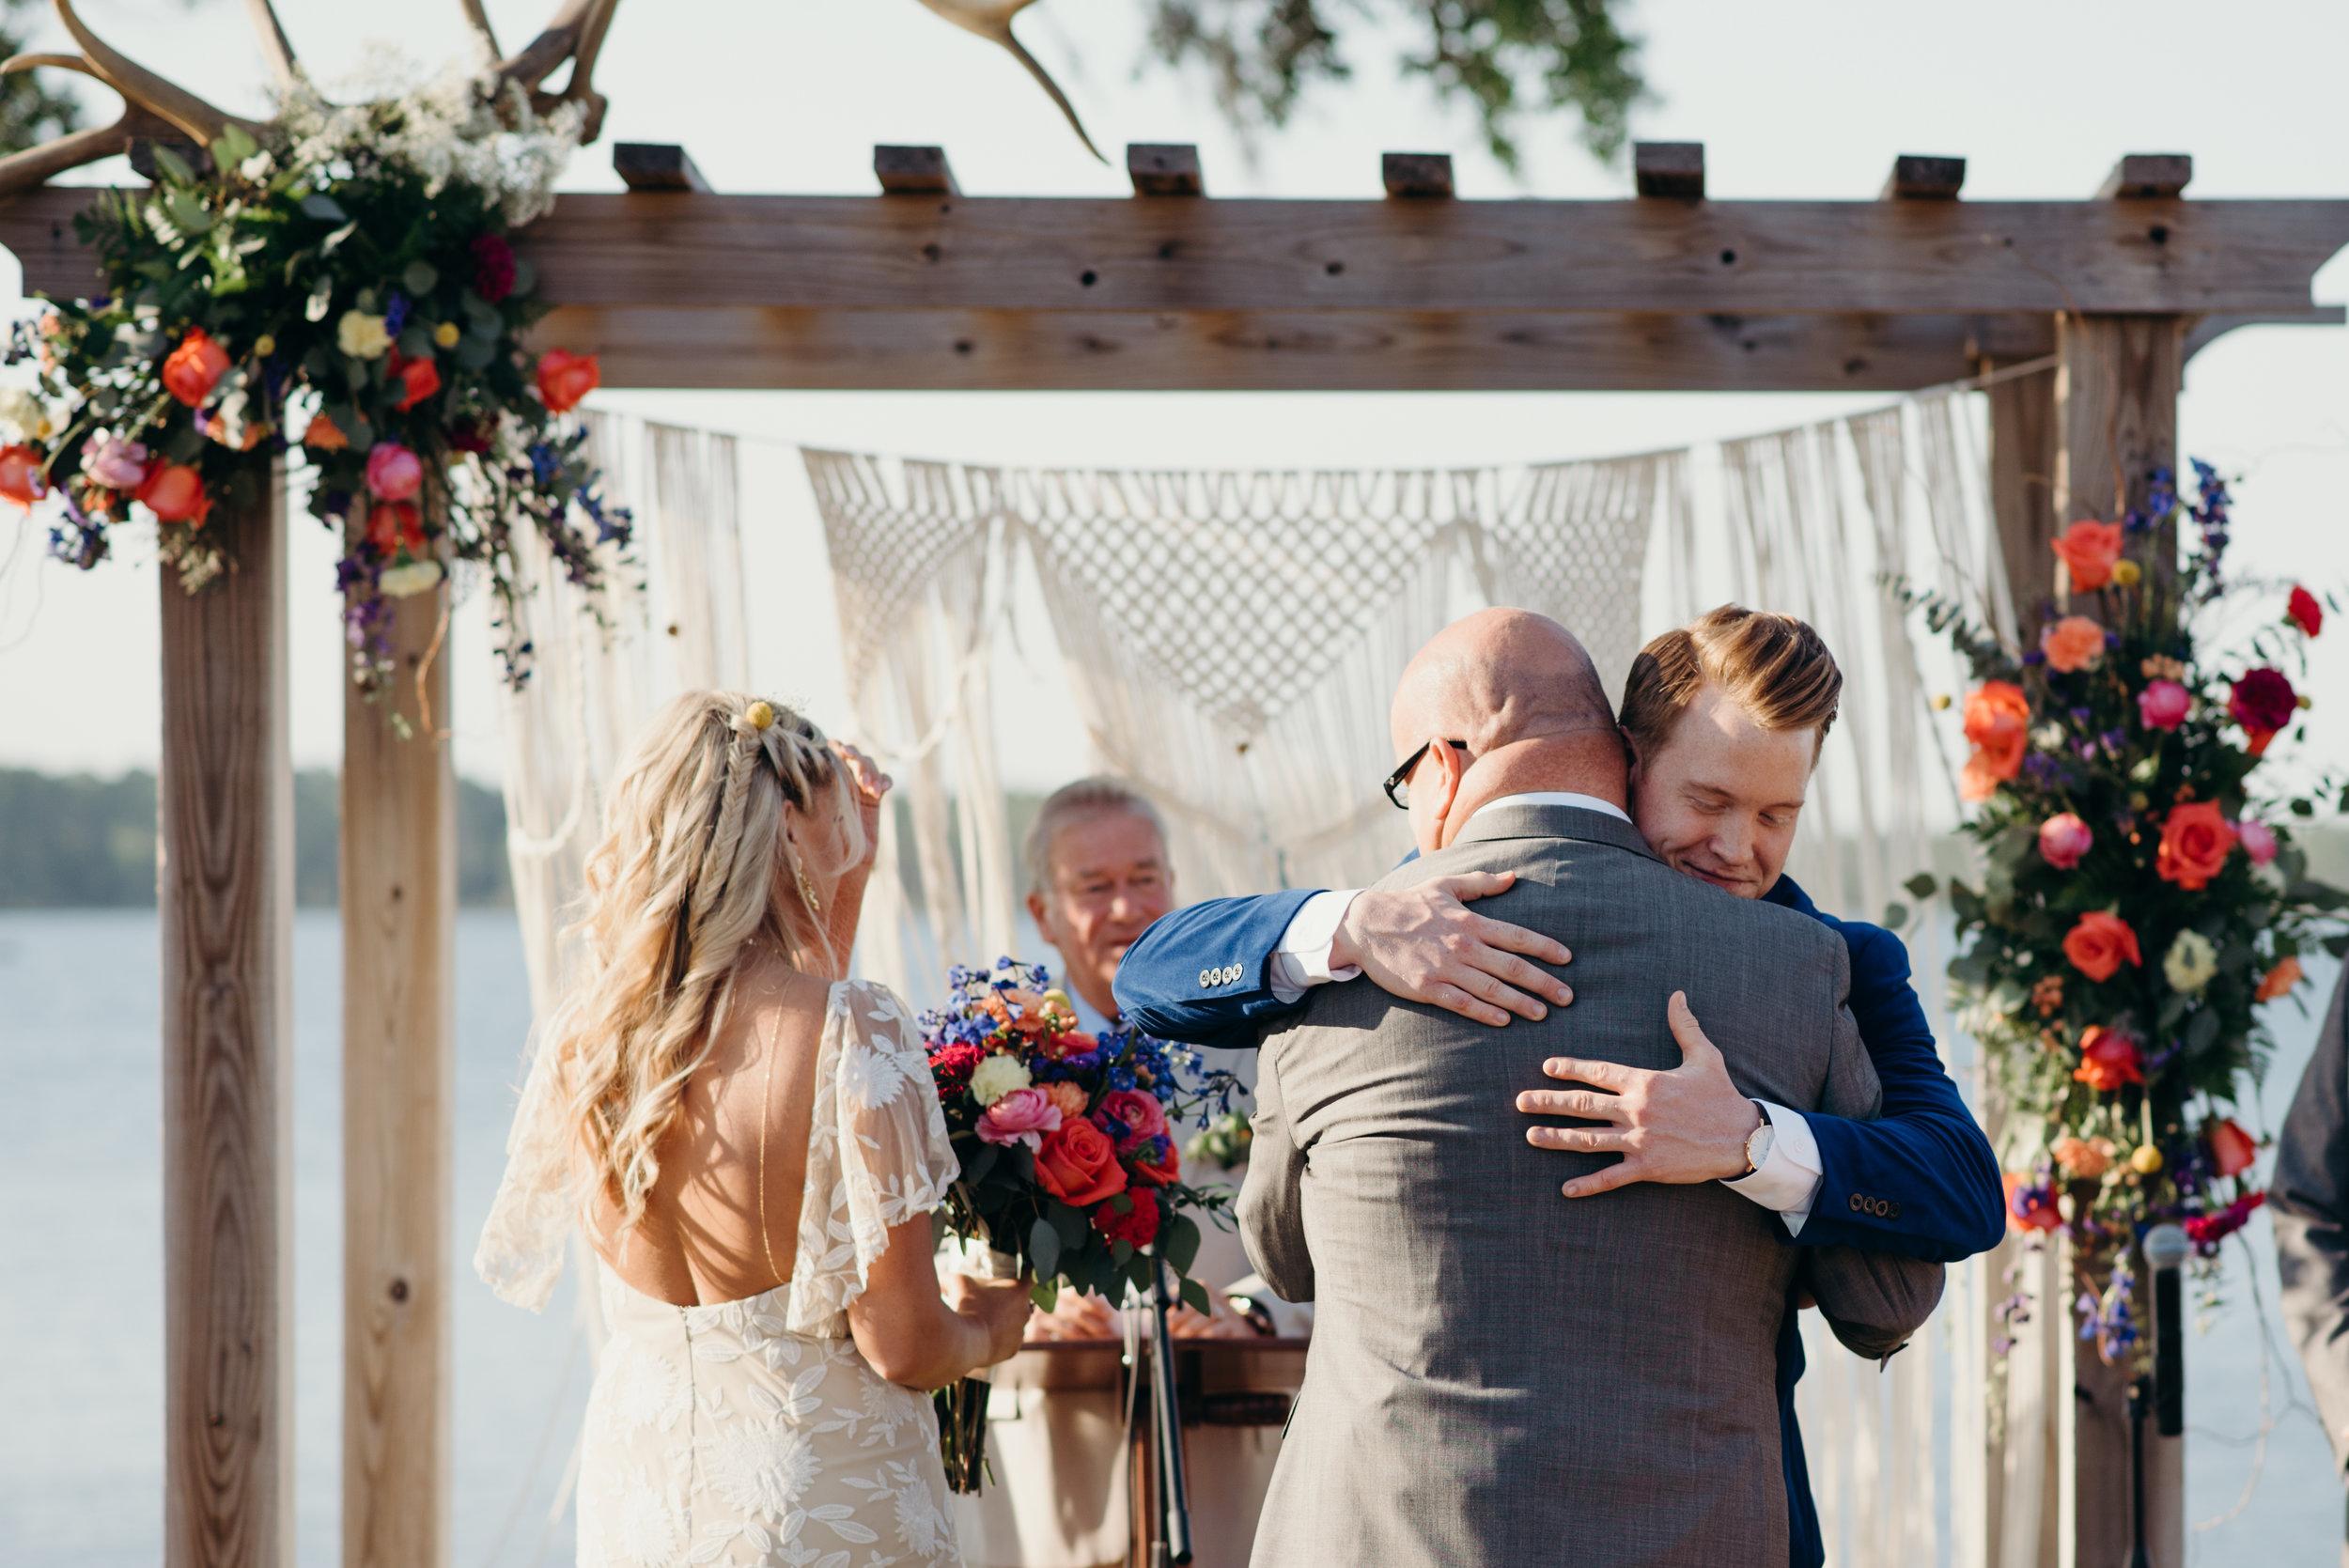 zayda-collin-panama-city-wedding-photography-trippy-bohemian-lisa-frank-wedding-ceremony-50.jpg